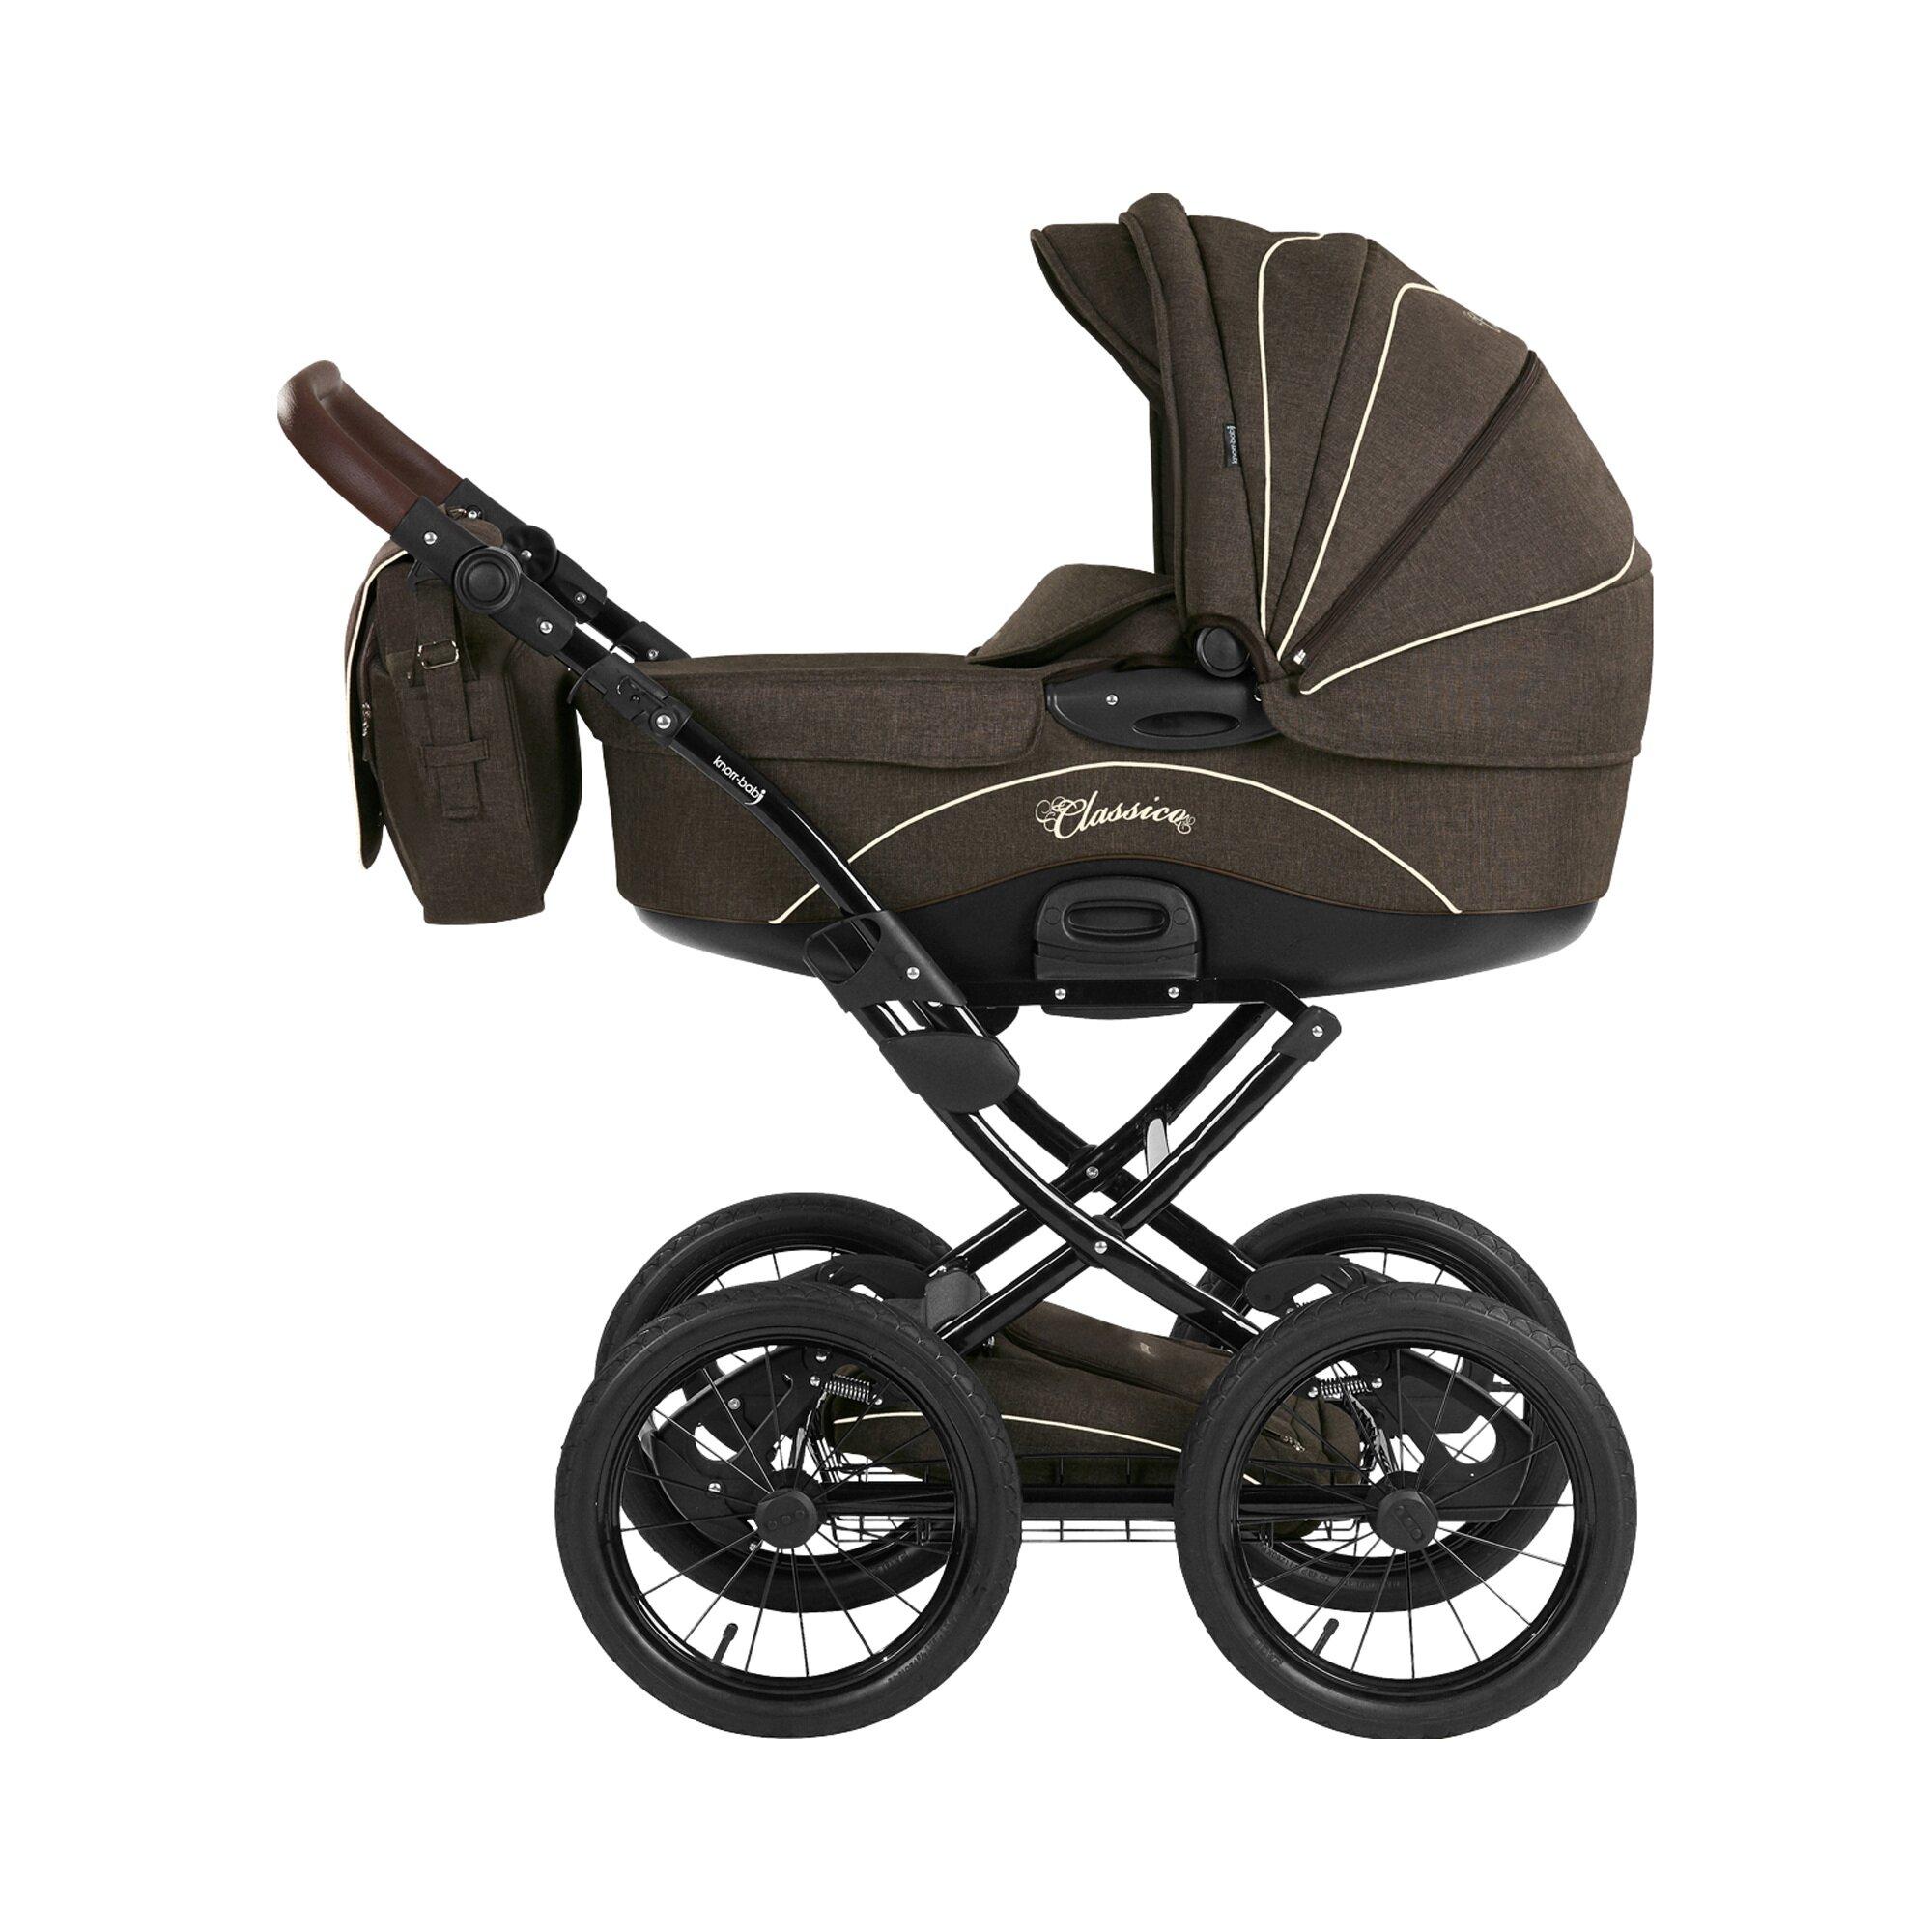 knorr-baby-kombikinderwagen-classico-braun